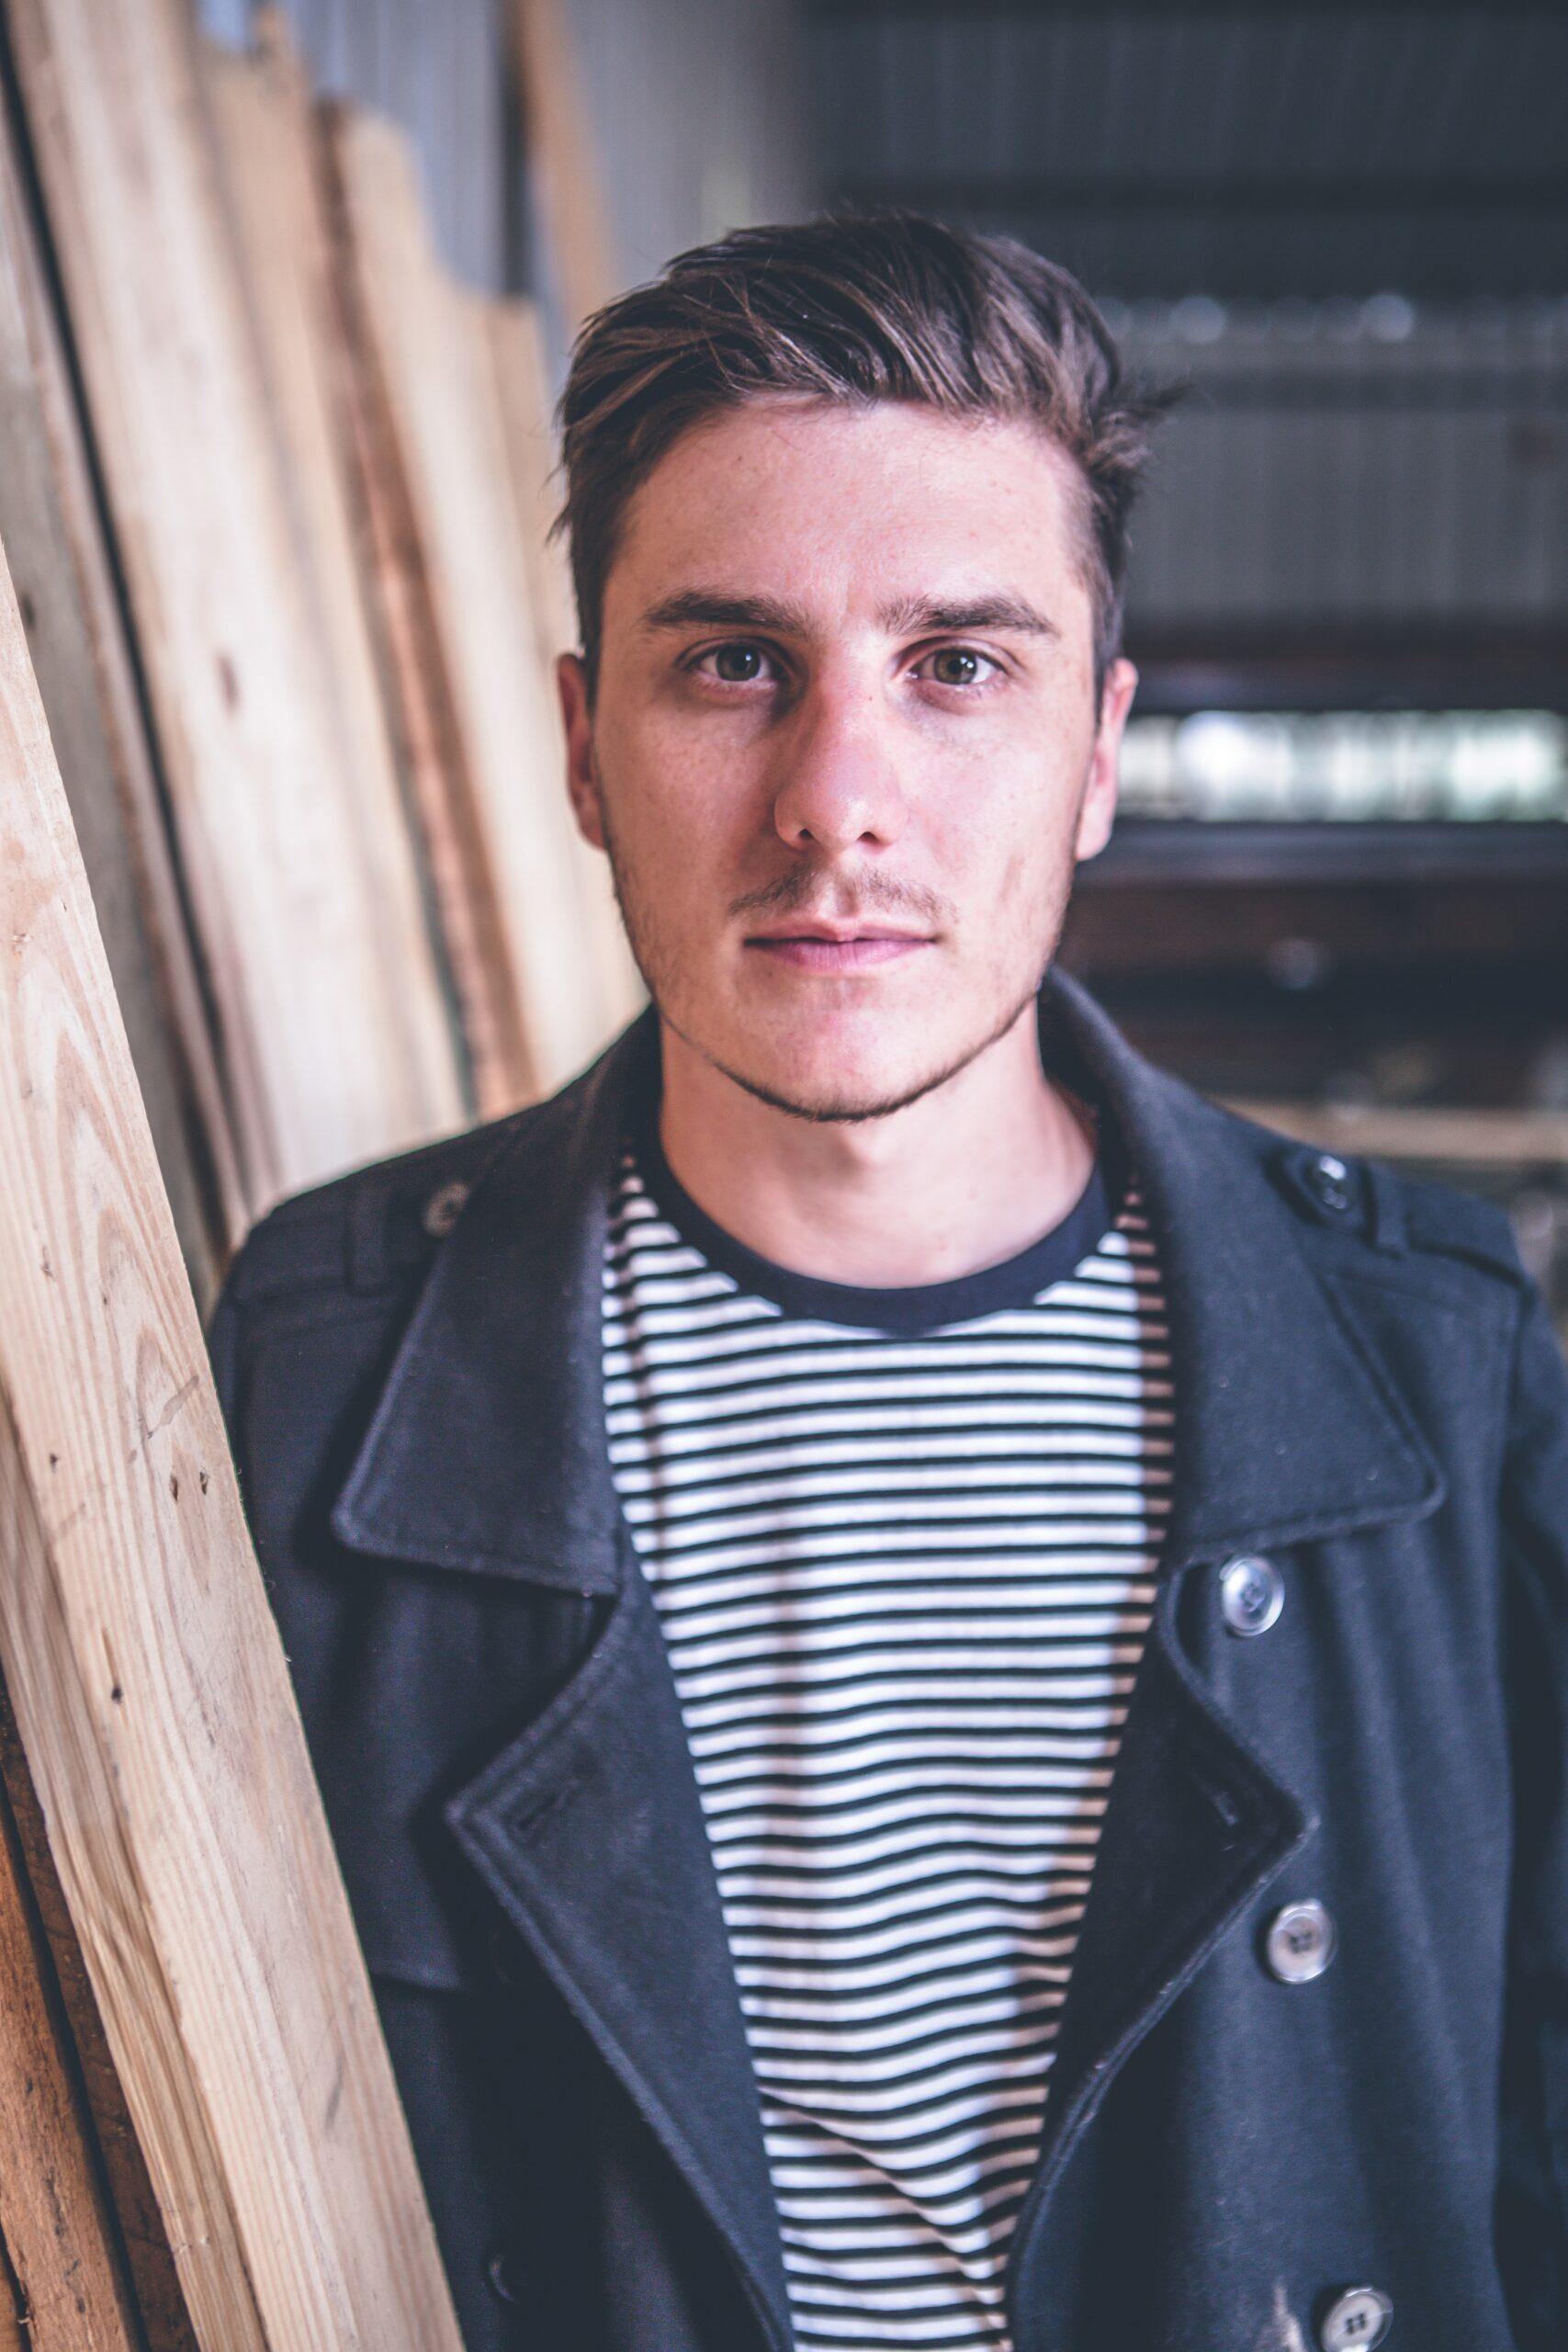 man standing beside wood planks